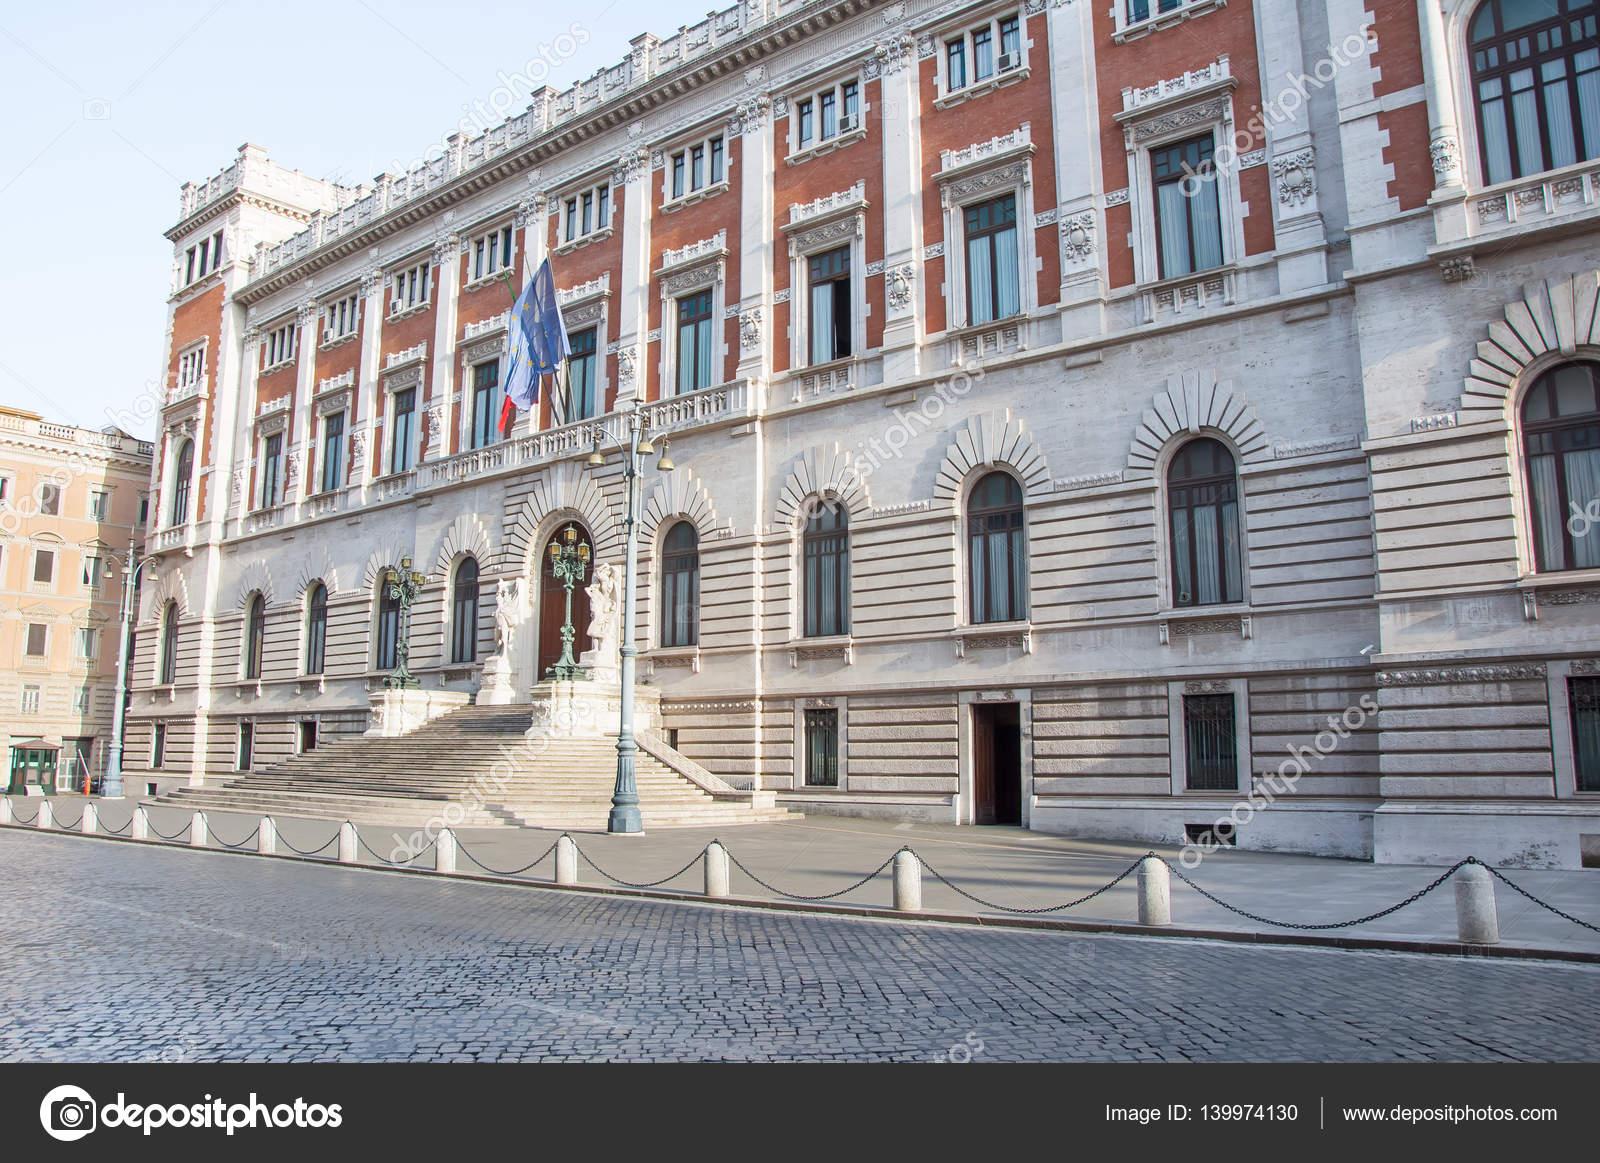 R ma augusztus palazzo montecitorio homlokzat augusztus for Parlamento montecitorio